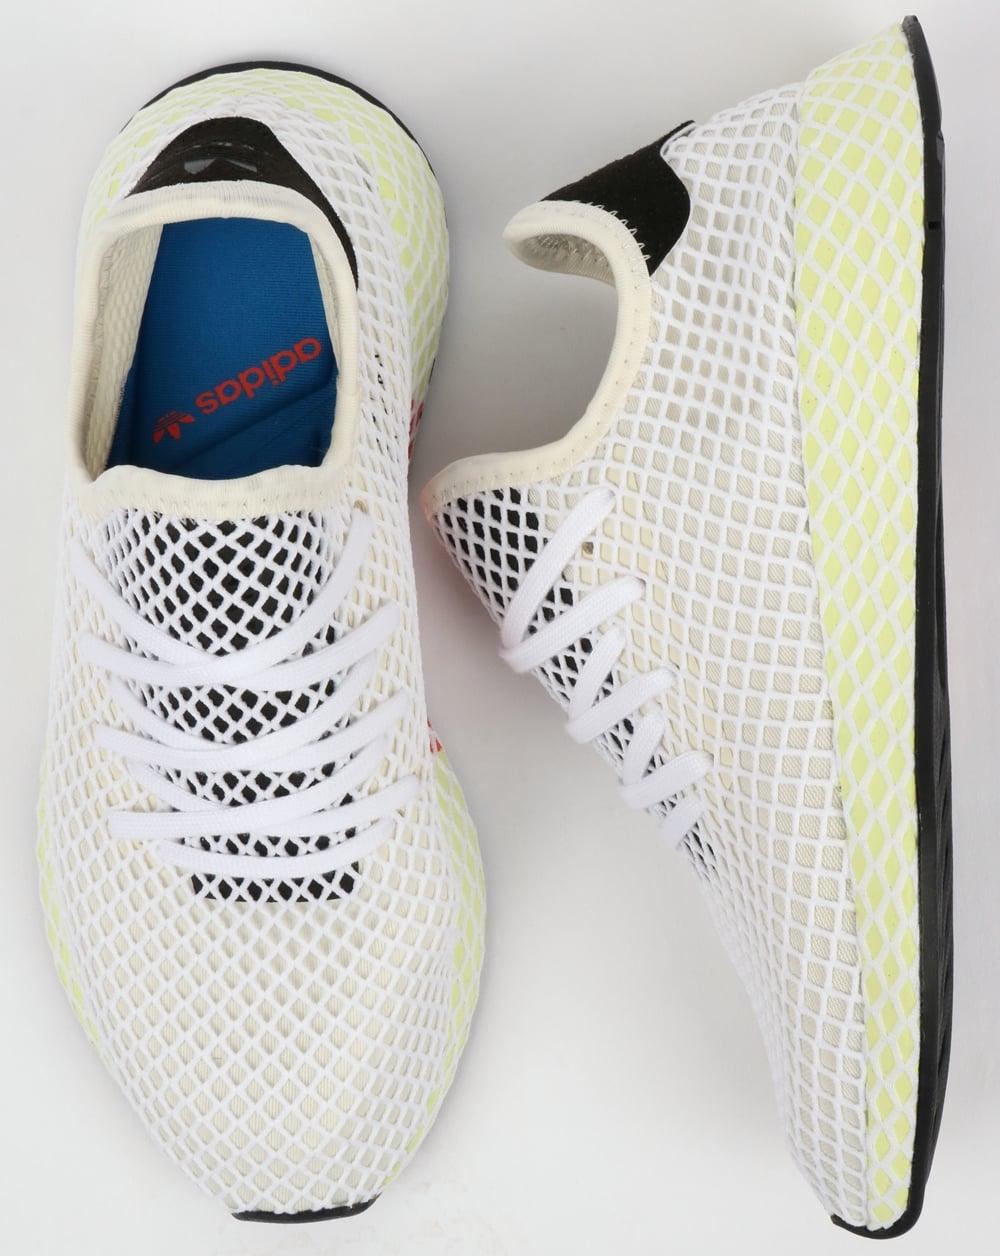 new arrival a1f94 a4d7b Adidas Deerupt Runner Trainers Chalk WhiteBlack